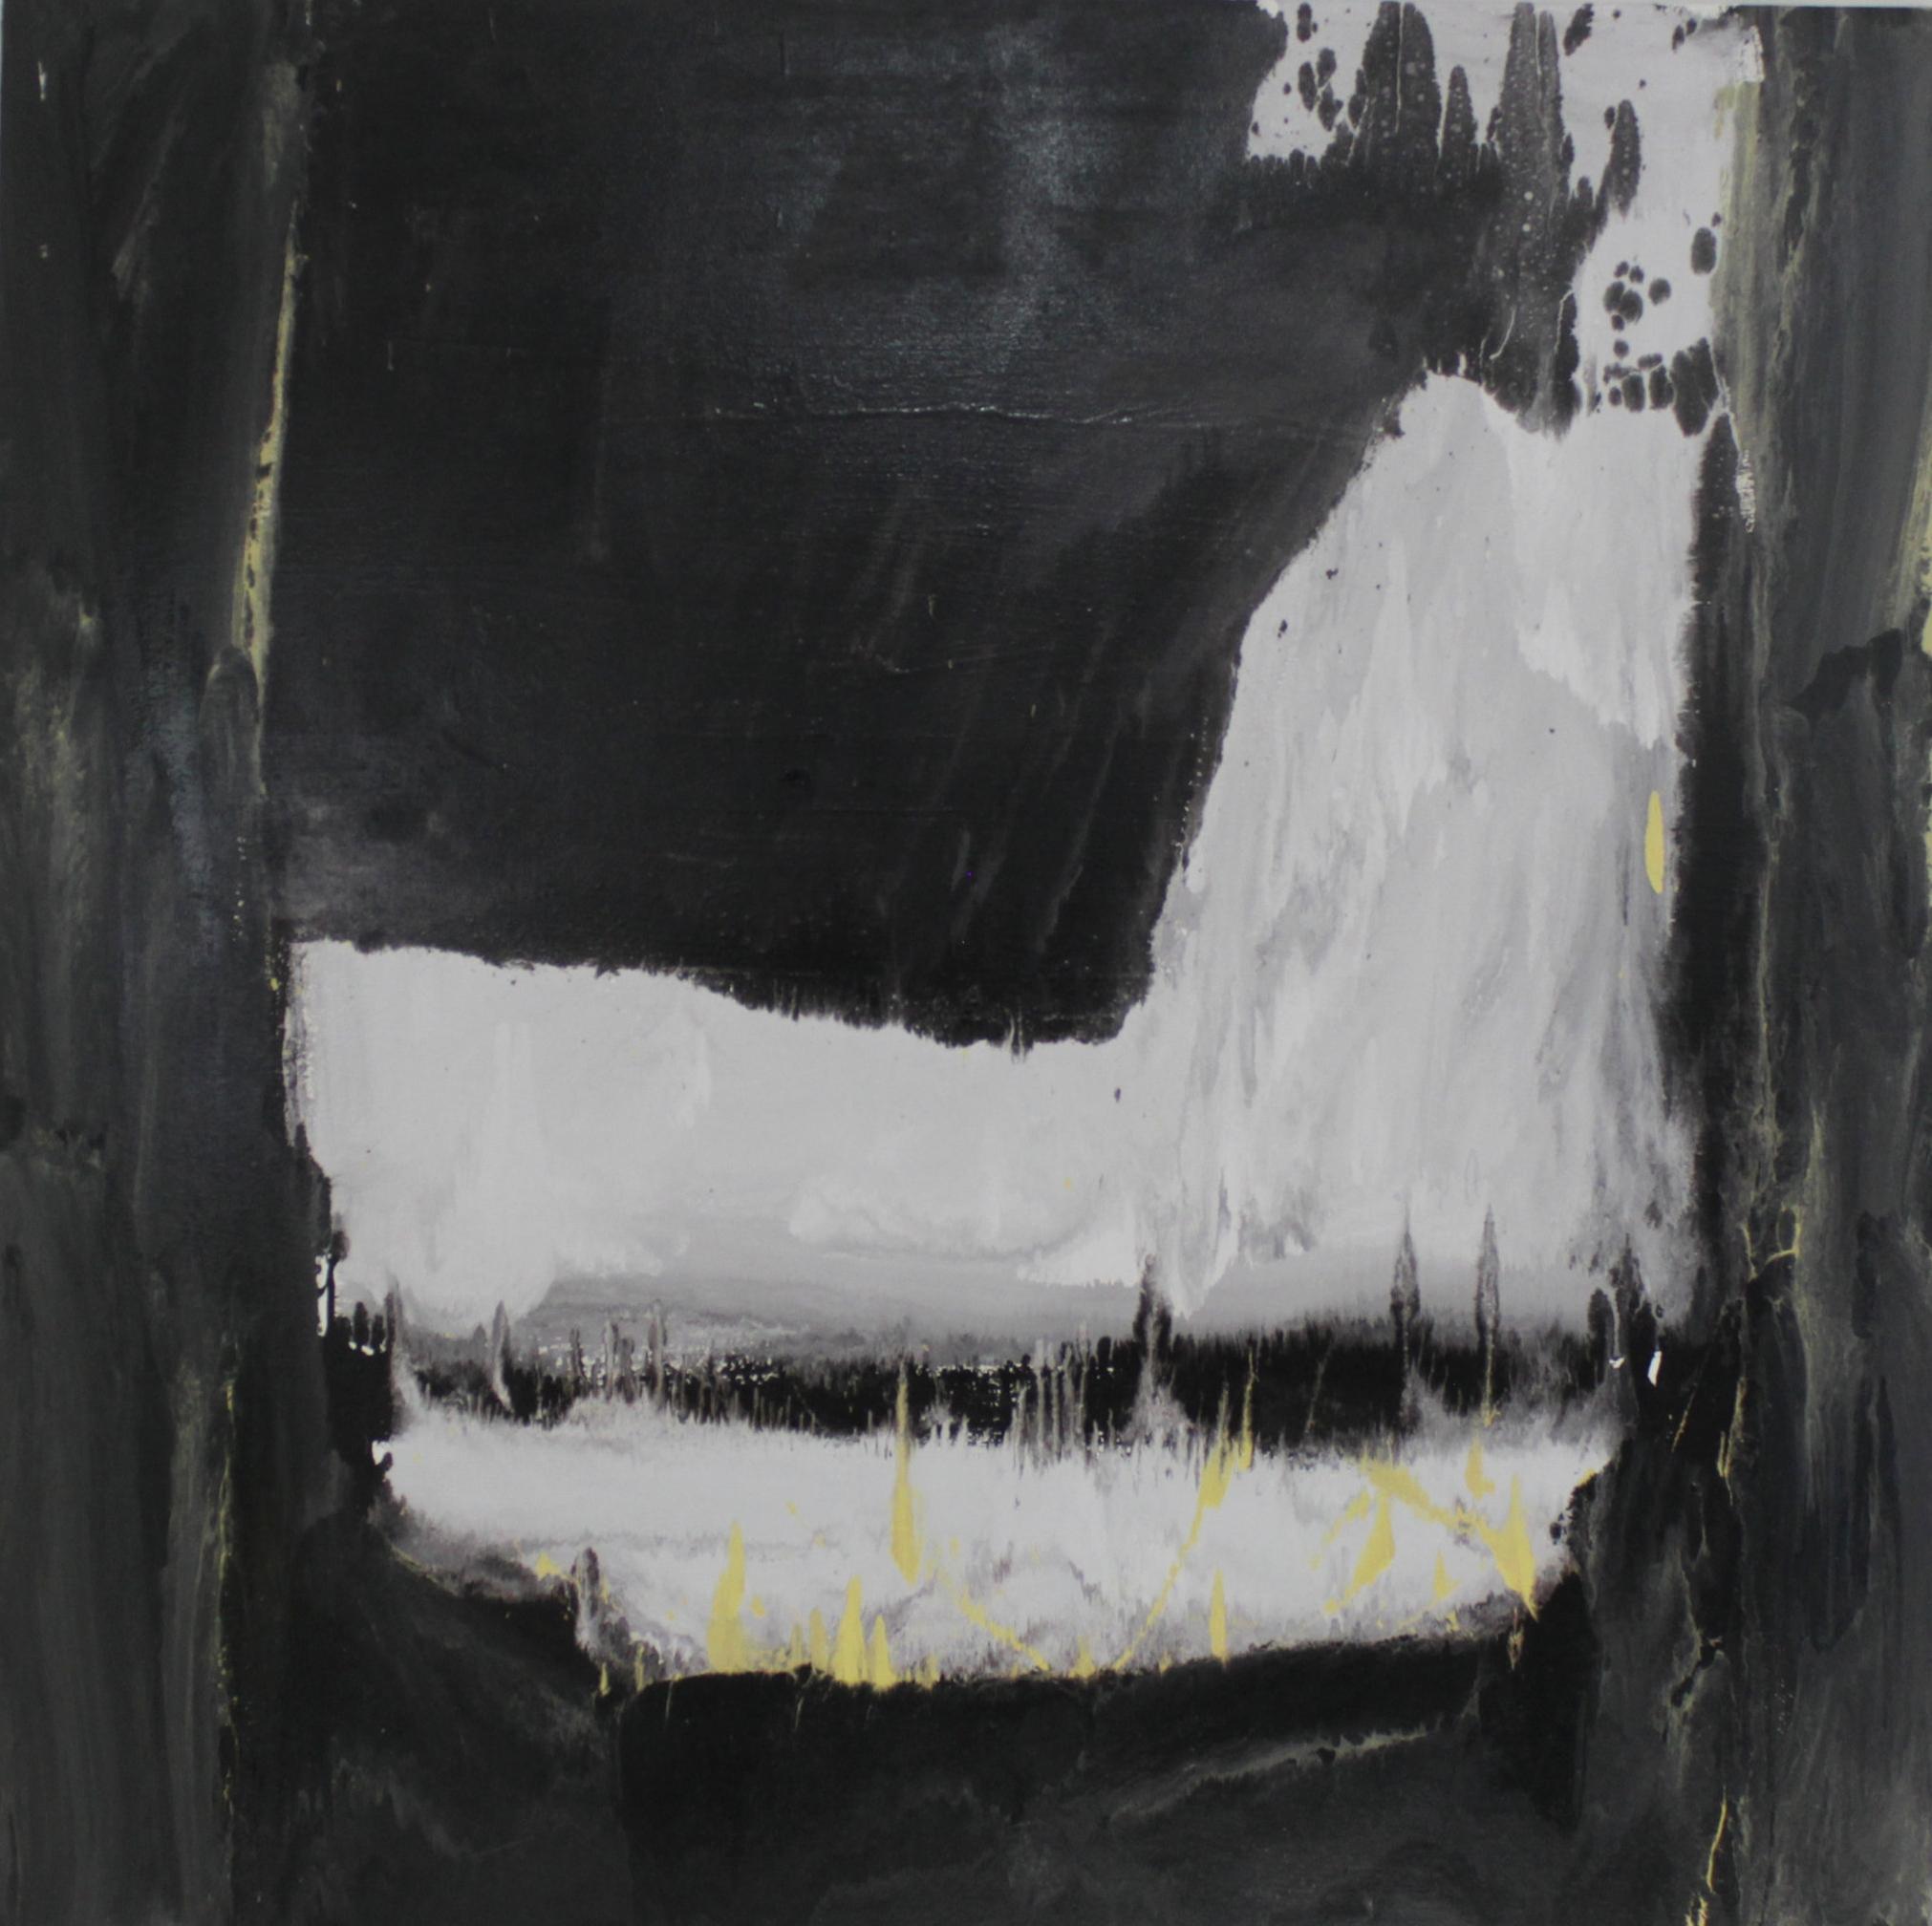 Untitled, 2016, enamel paint on canvas, 152 x 152 cm